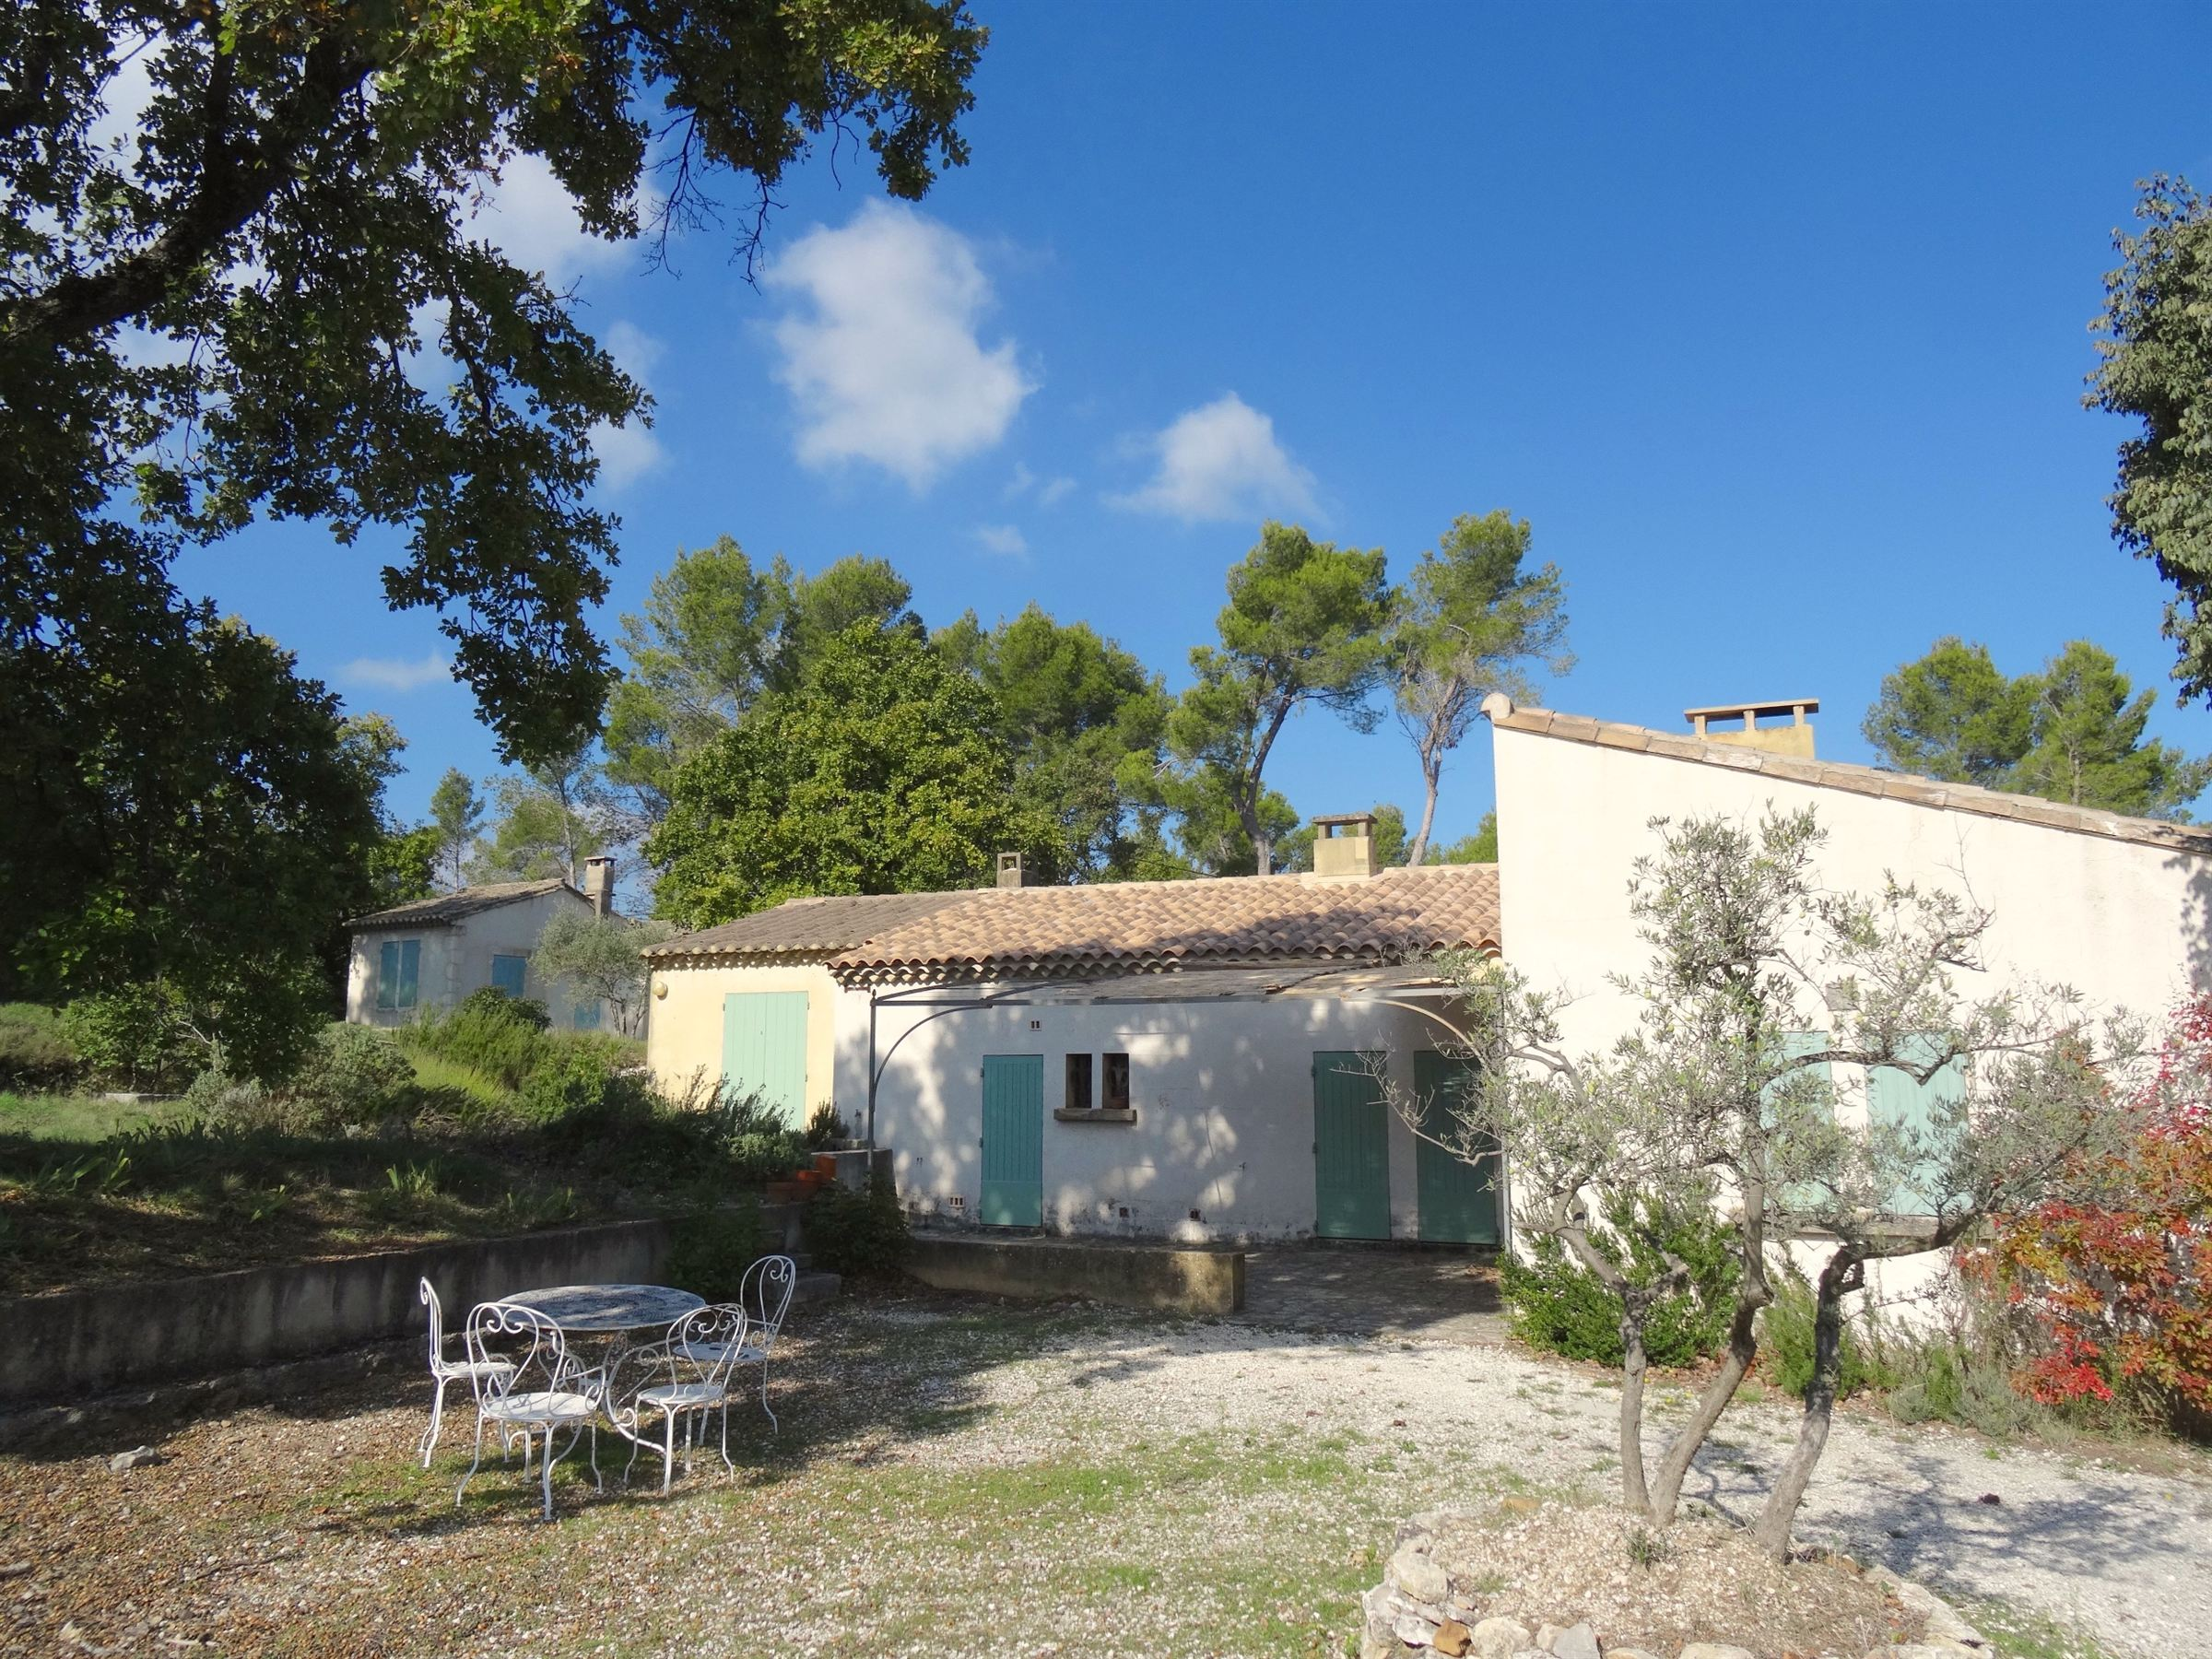 Nhà ở một gia đình vì Bán tại A plot of 5 acres with a view of the alpille close to the town center Other Provence-Alpes-Cote D'Azur, Provence-Alpes-Cote D'Azur, 13210 Pháp